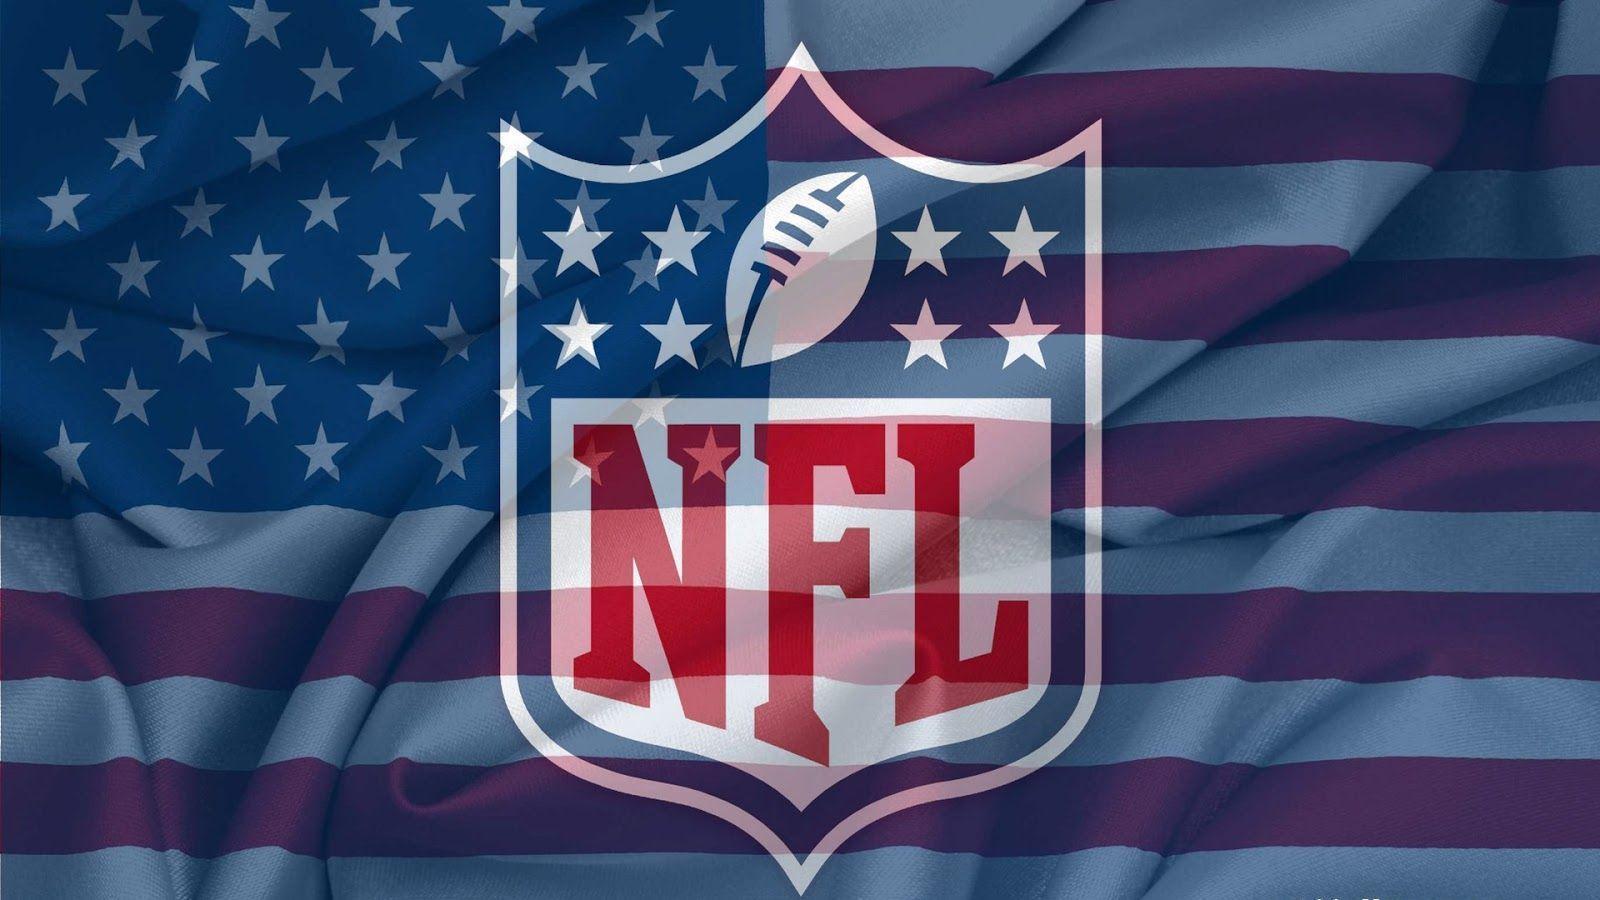 American Football HD Wallpapers - HD Wallpapers Inn